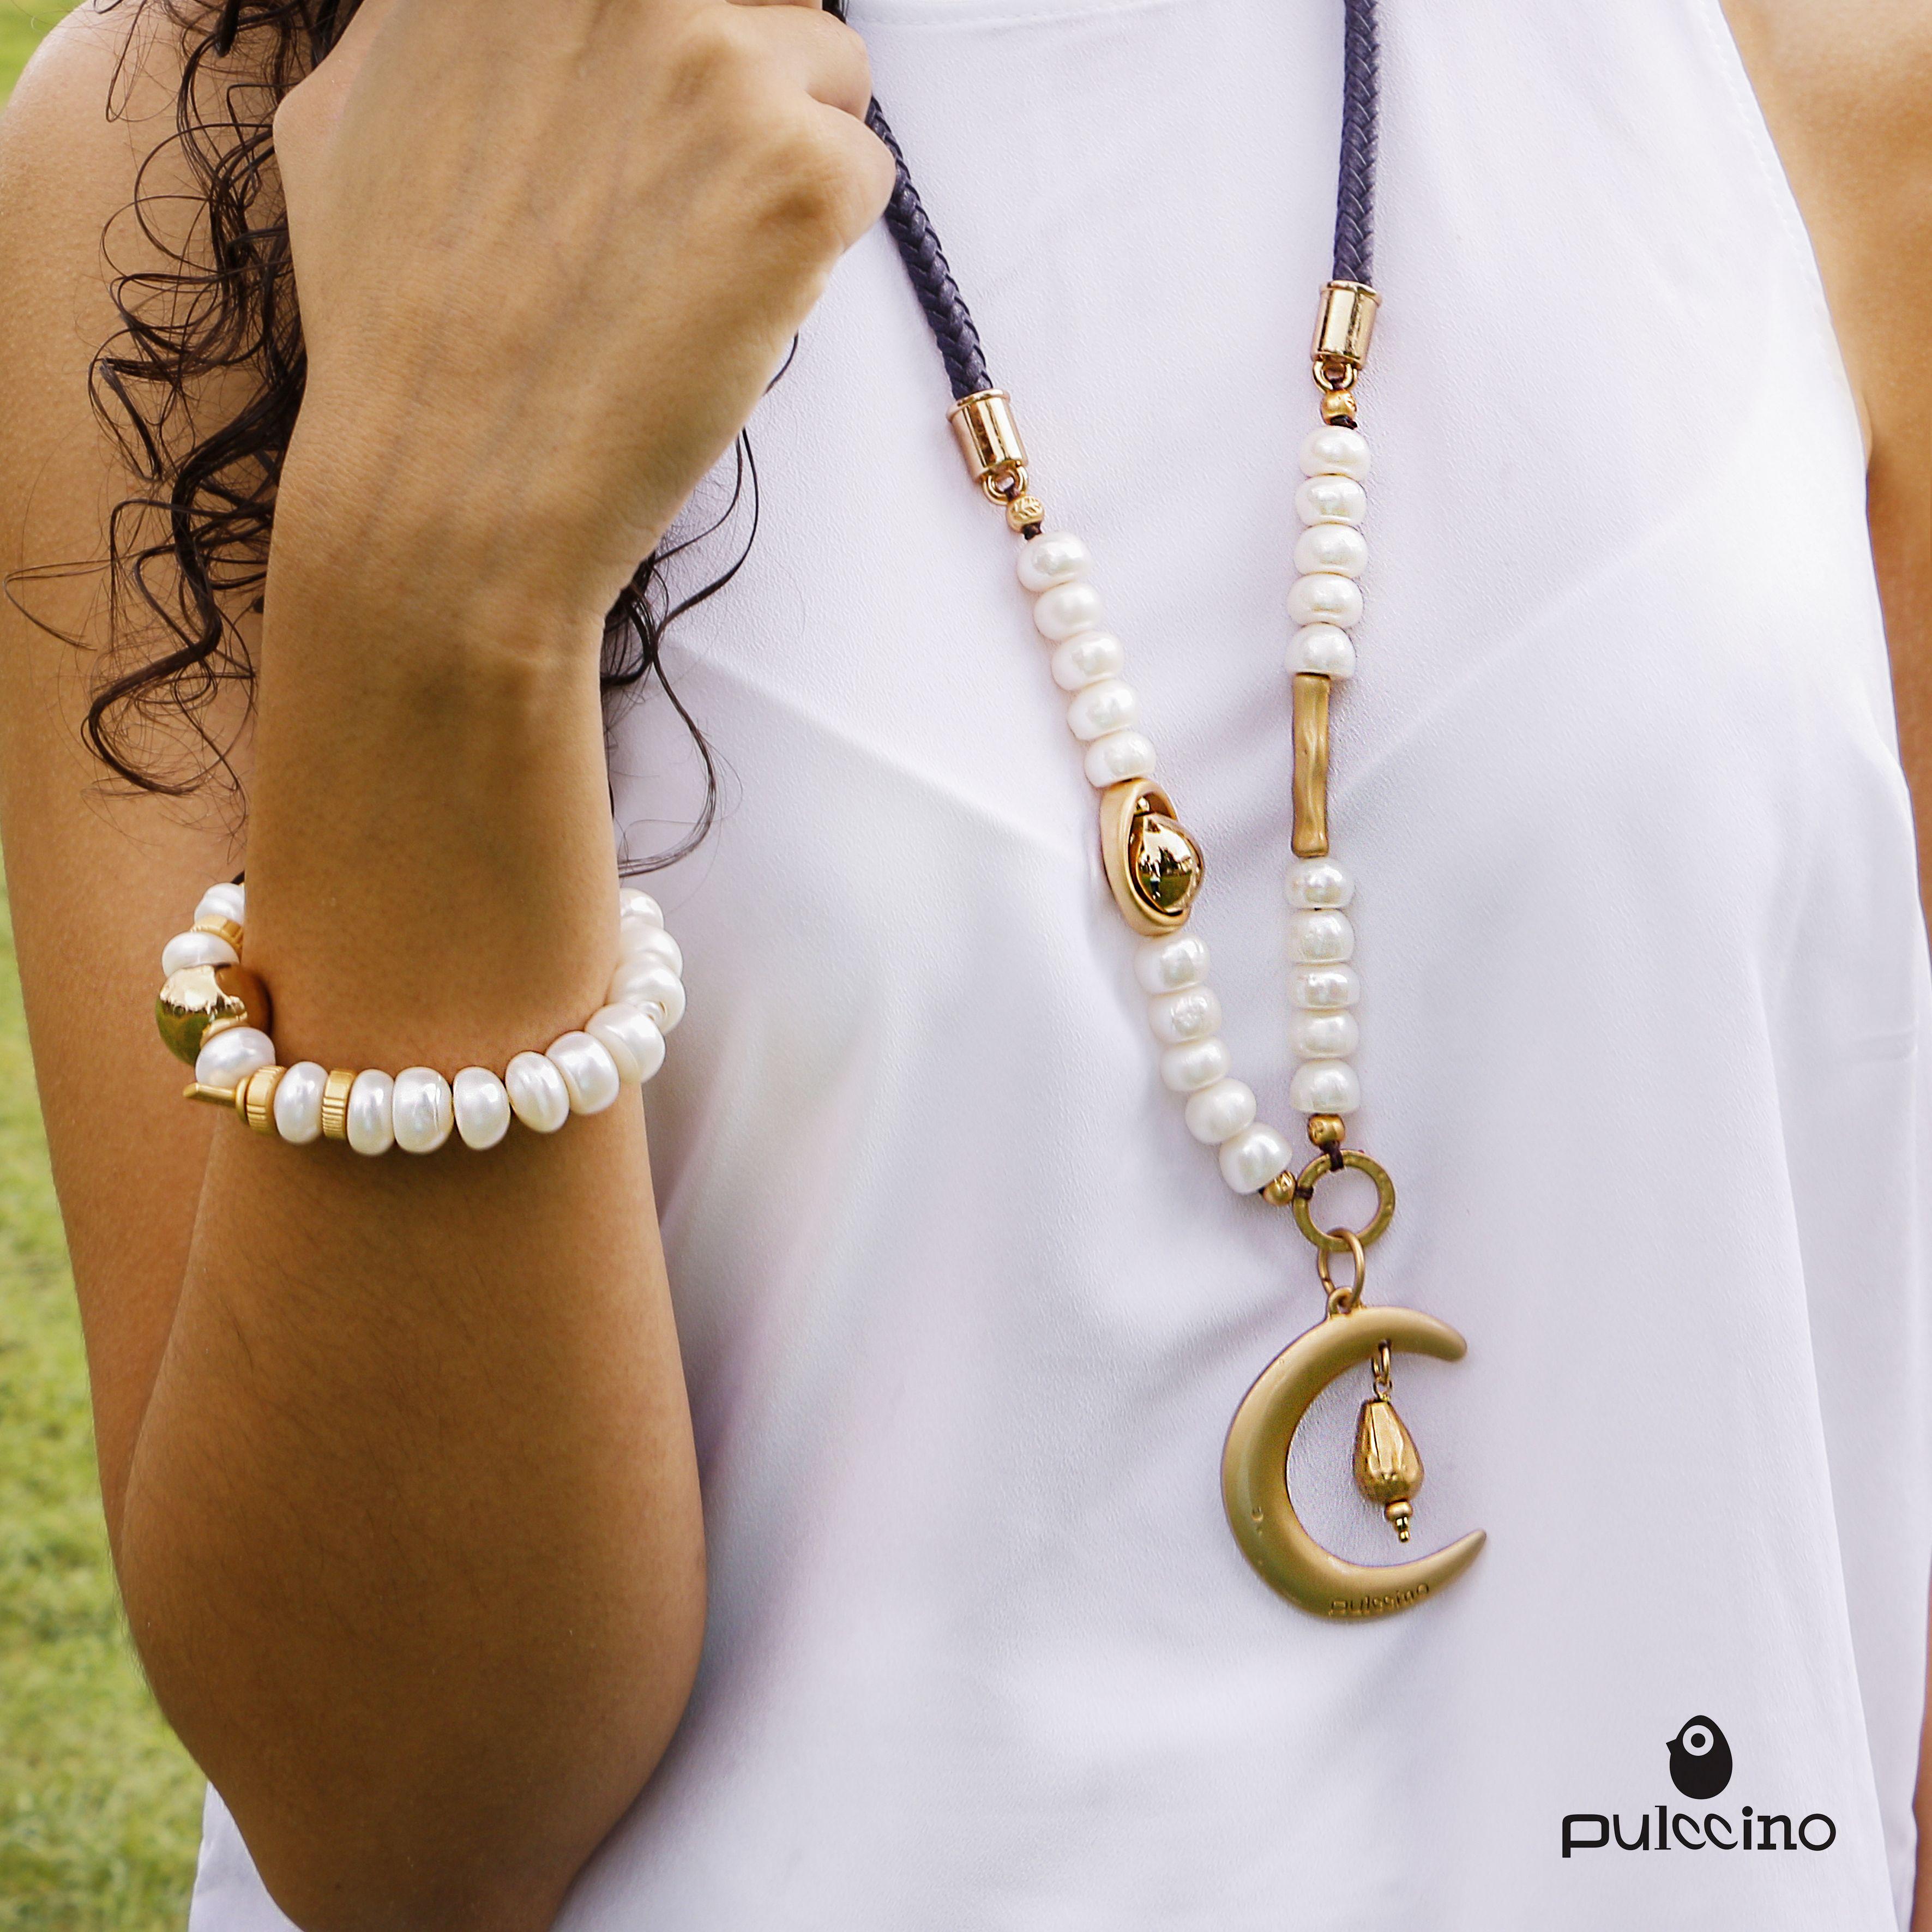 a857467c8f20 pulccino #accesorios #joyeria #jewelry #accesories | Bisuteria ...